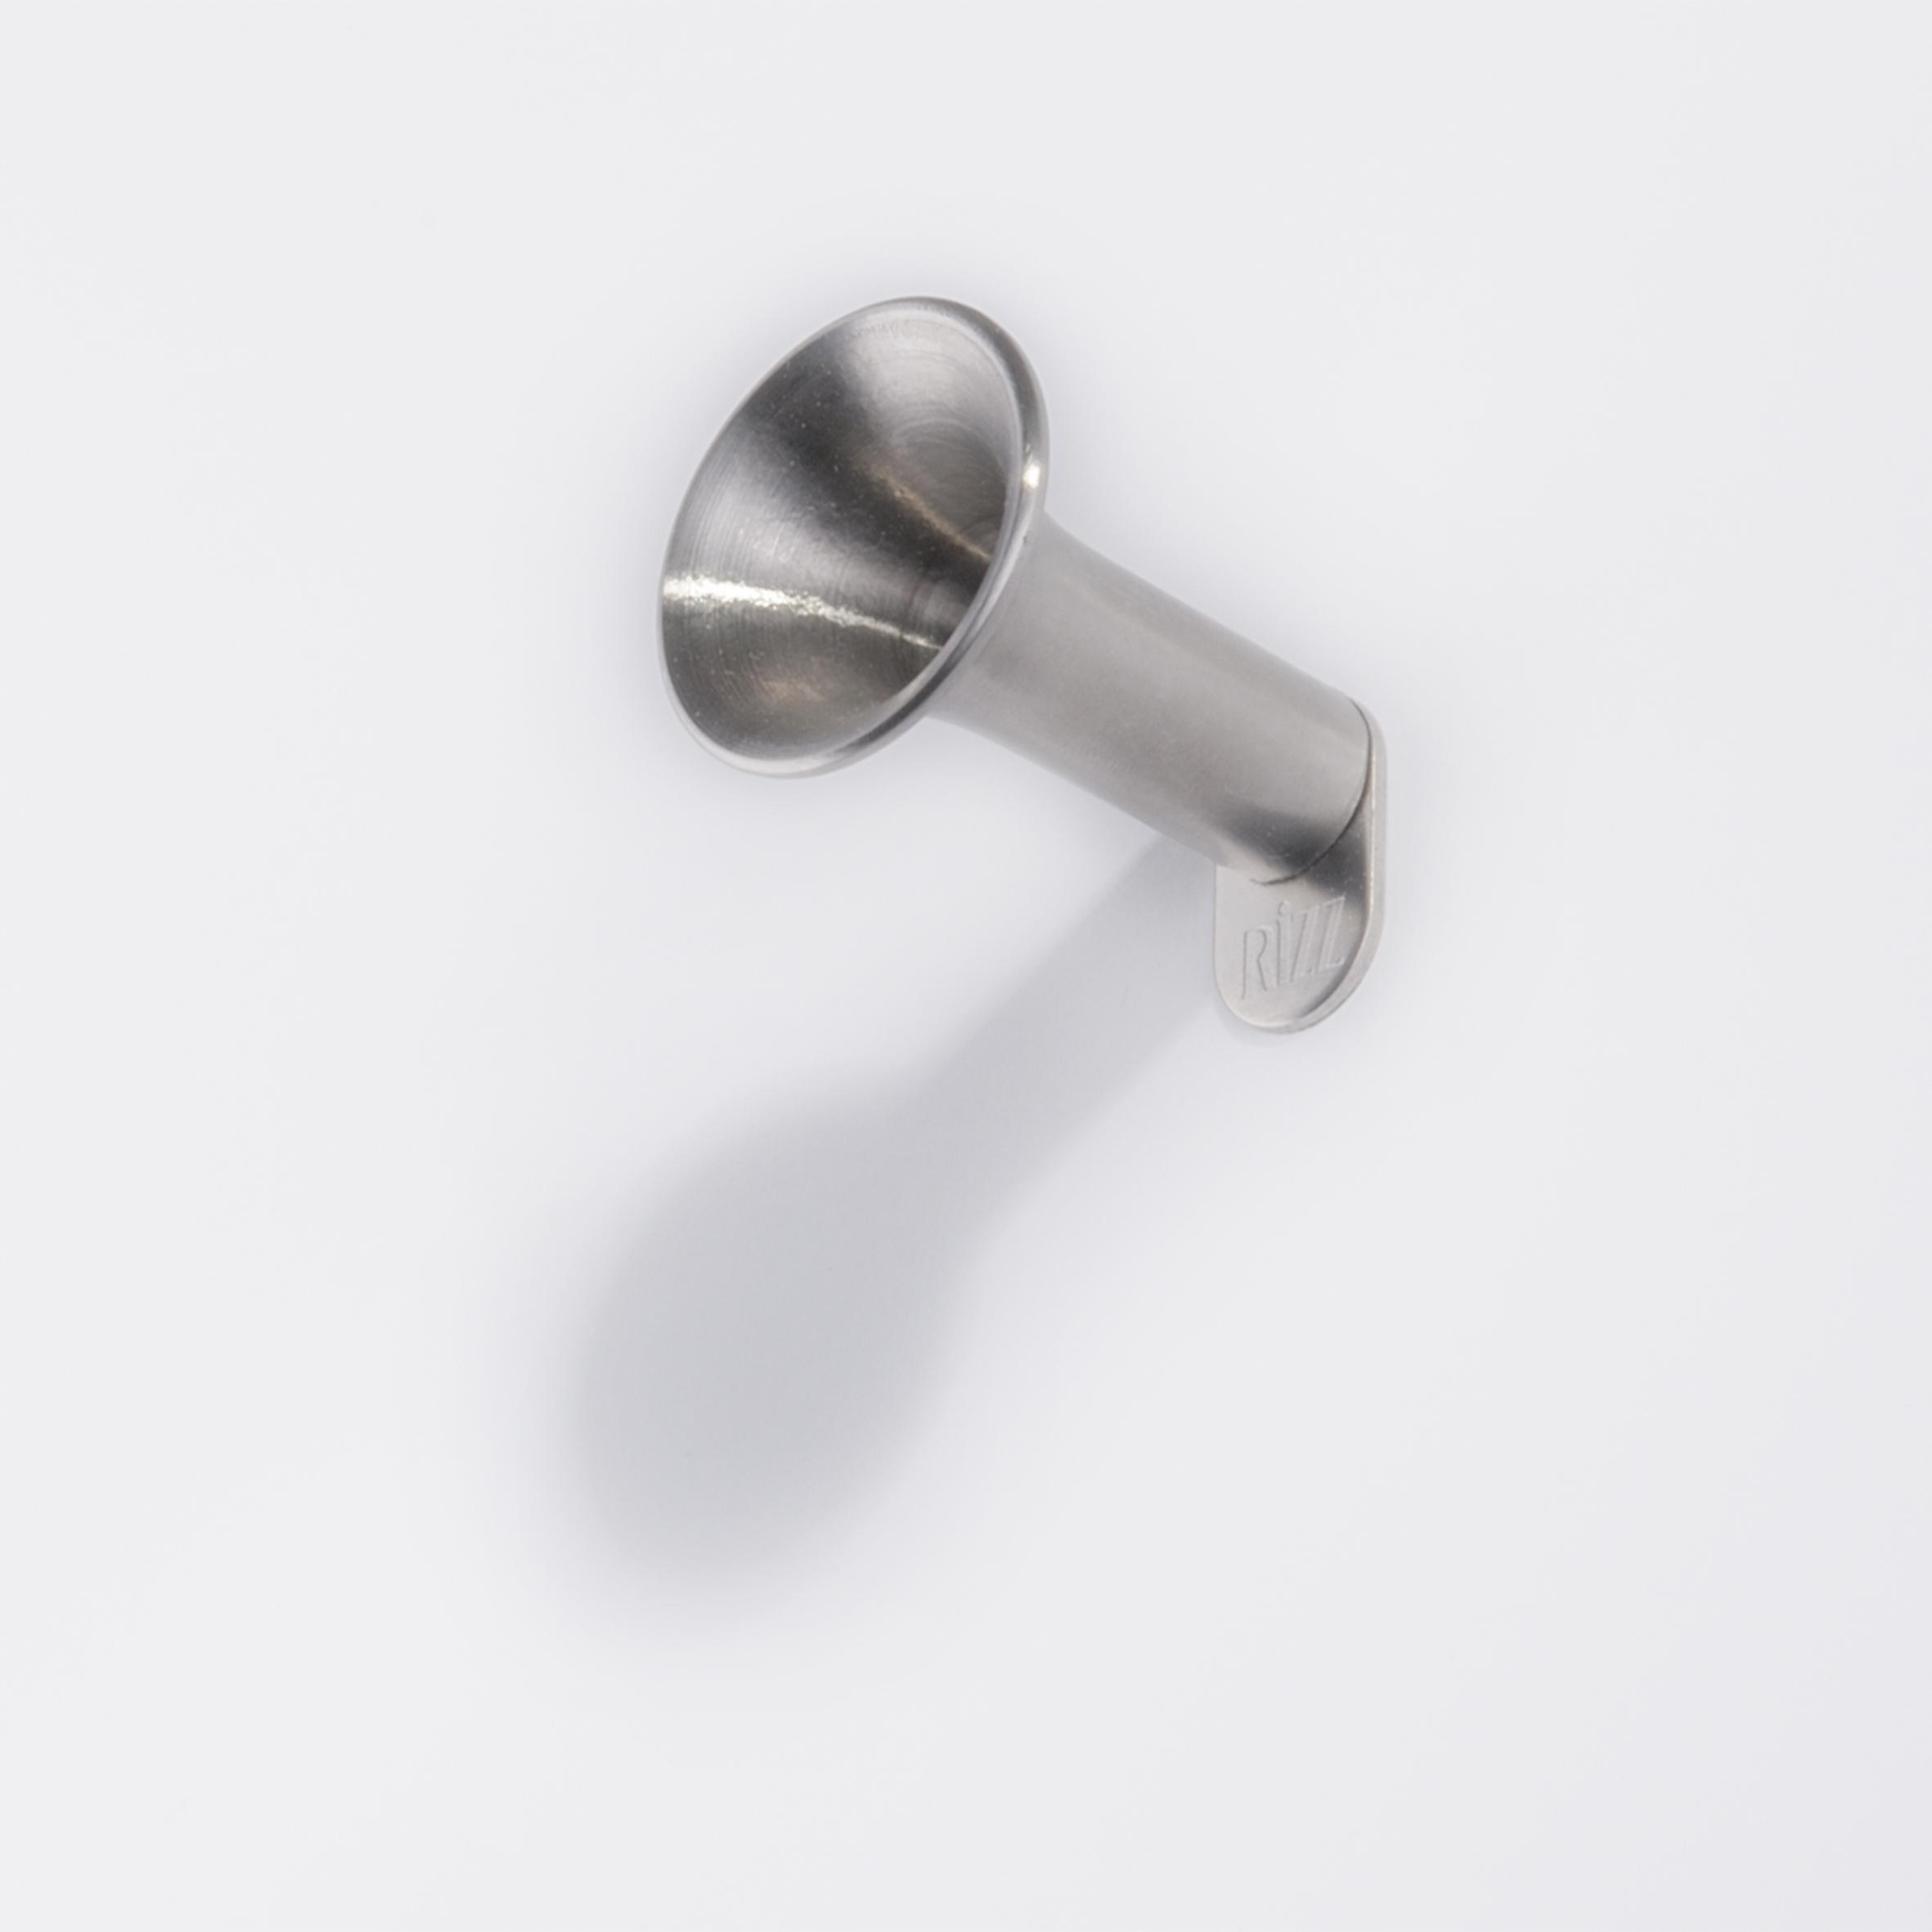 The_Trumpet-coathook-RiZZ-TeunFleskens_Designalive7